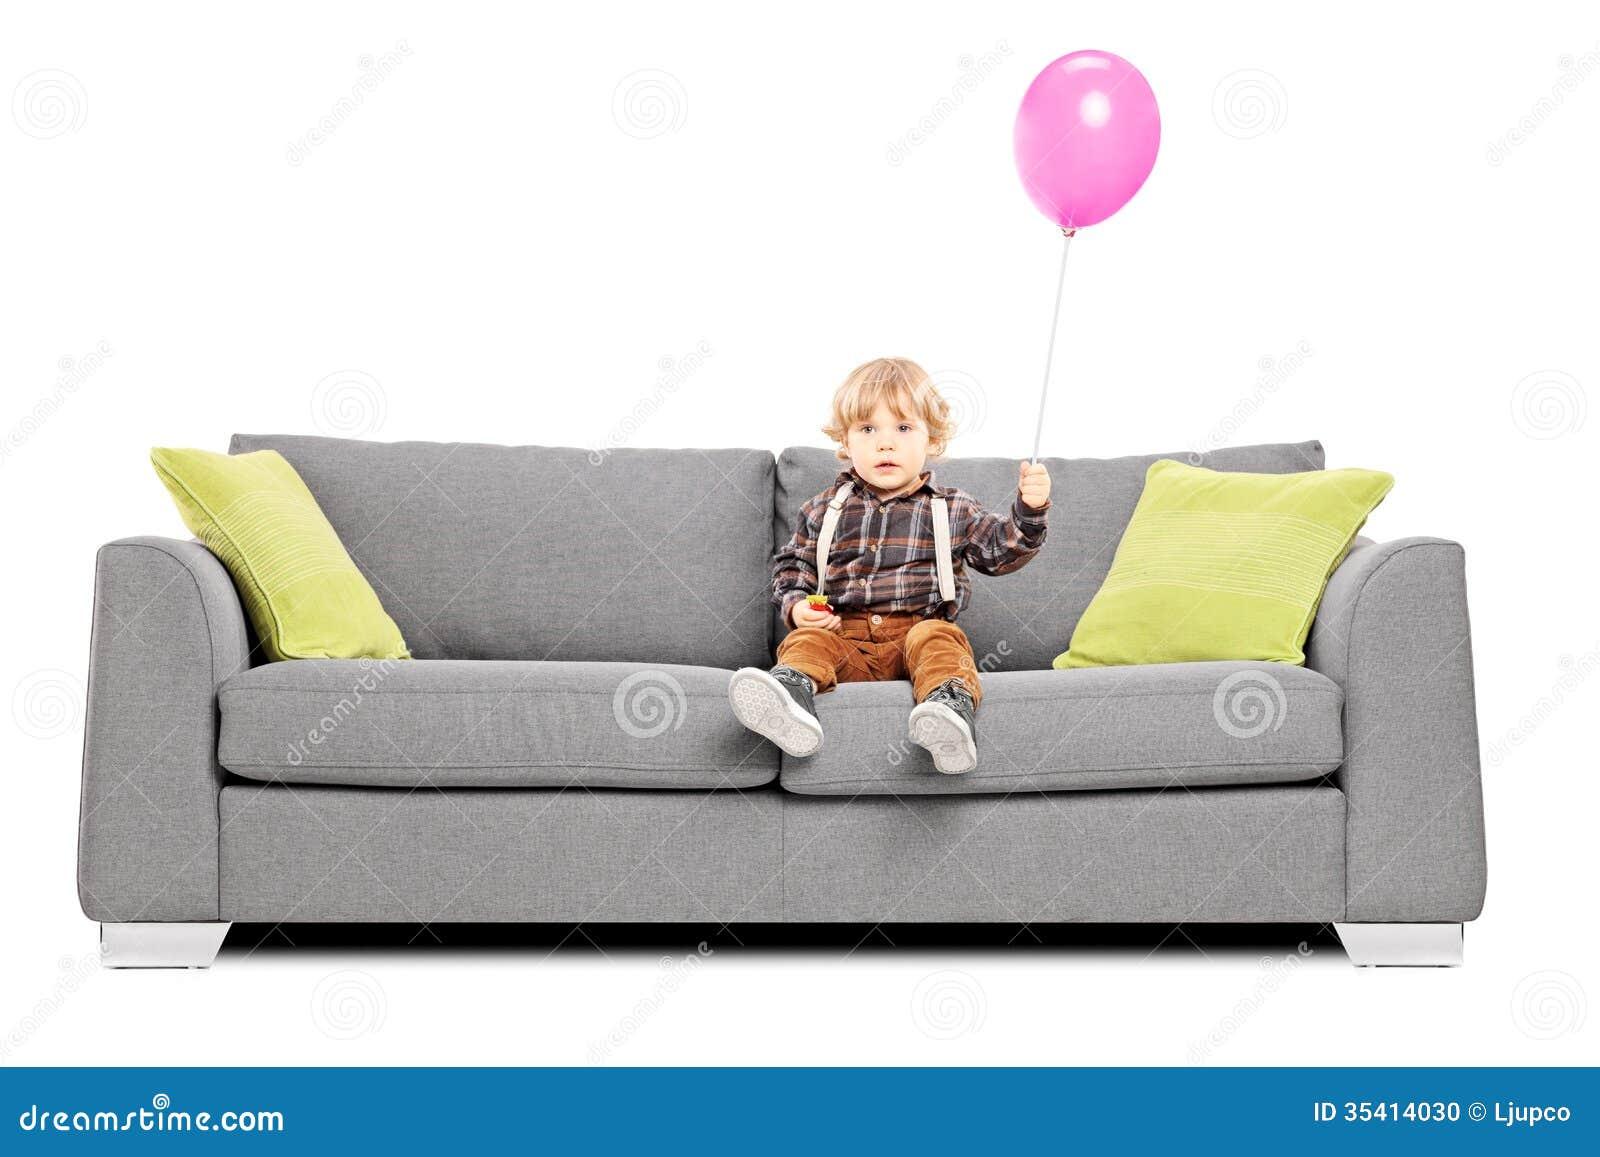 Cute Little Boy Sitting On Sofa With A Hot Air Balloon